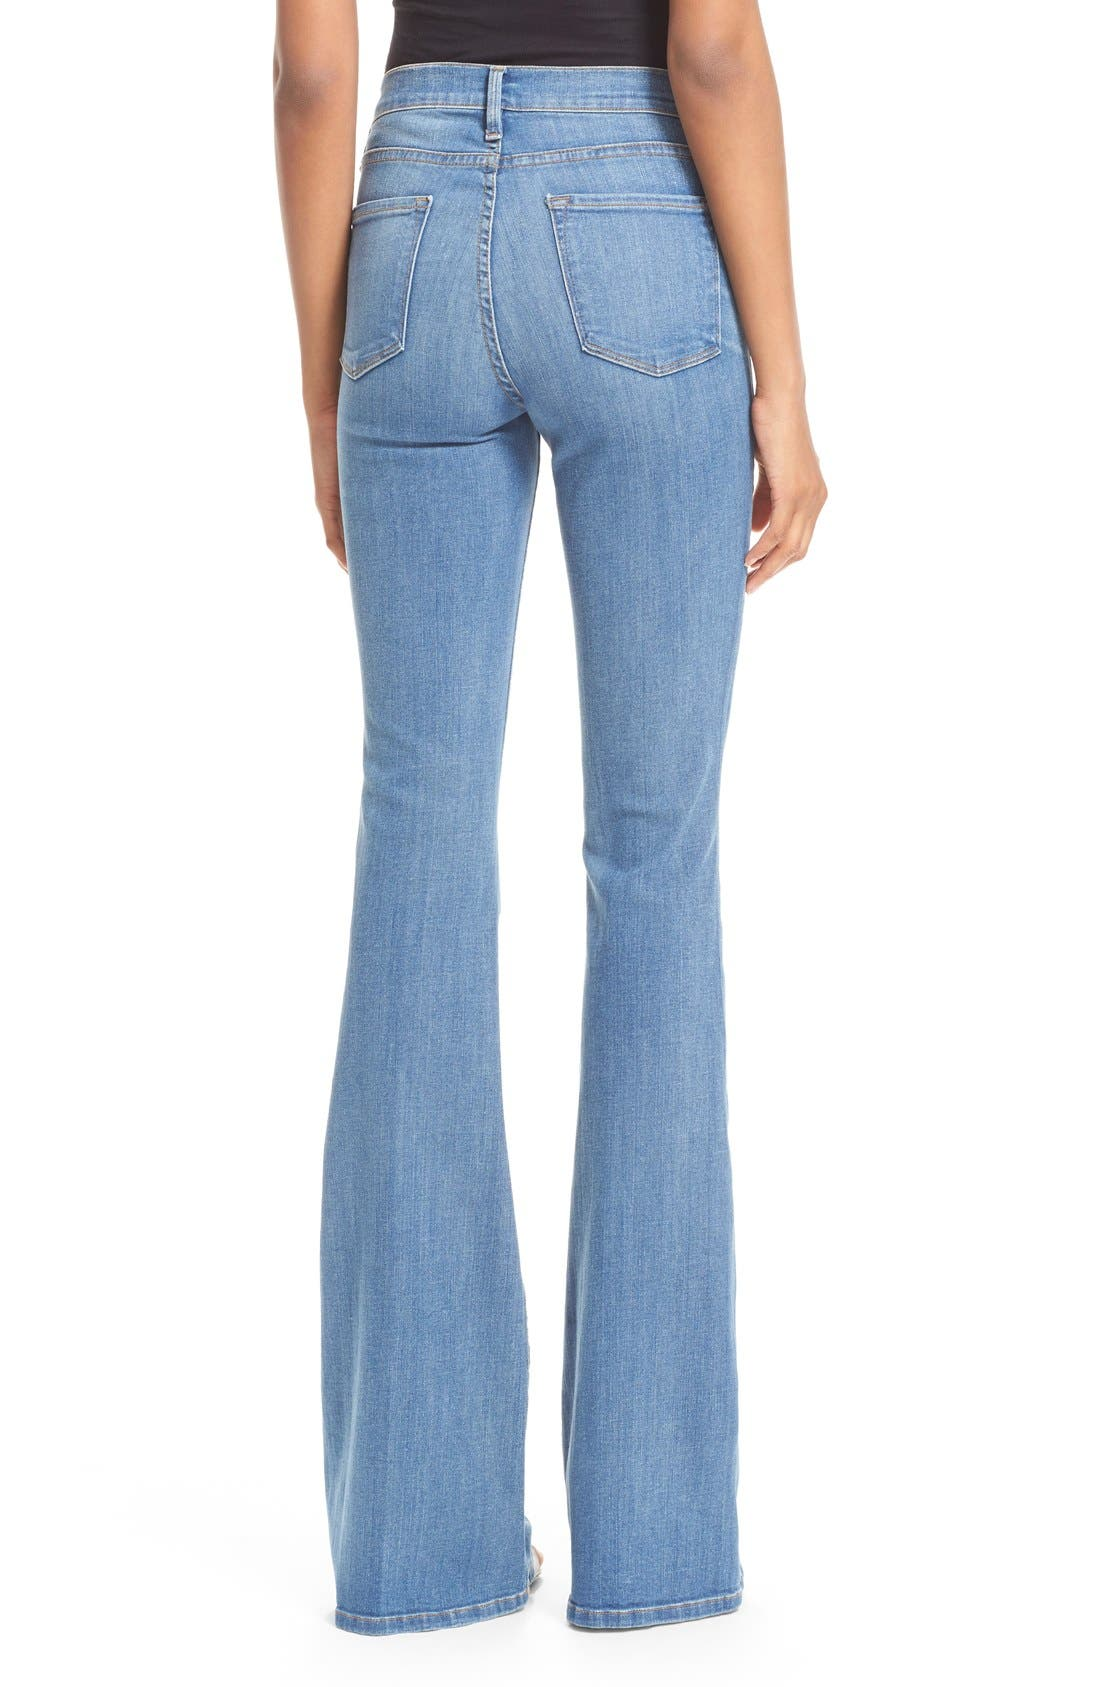 FRAME, Forever Karlie Flare Jeans, Alternate thumbnail 3, color, 401